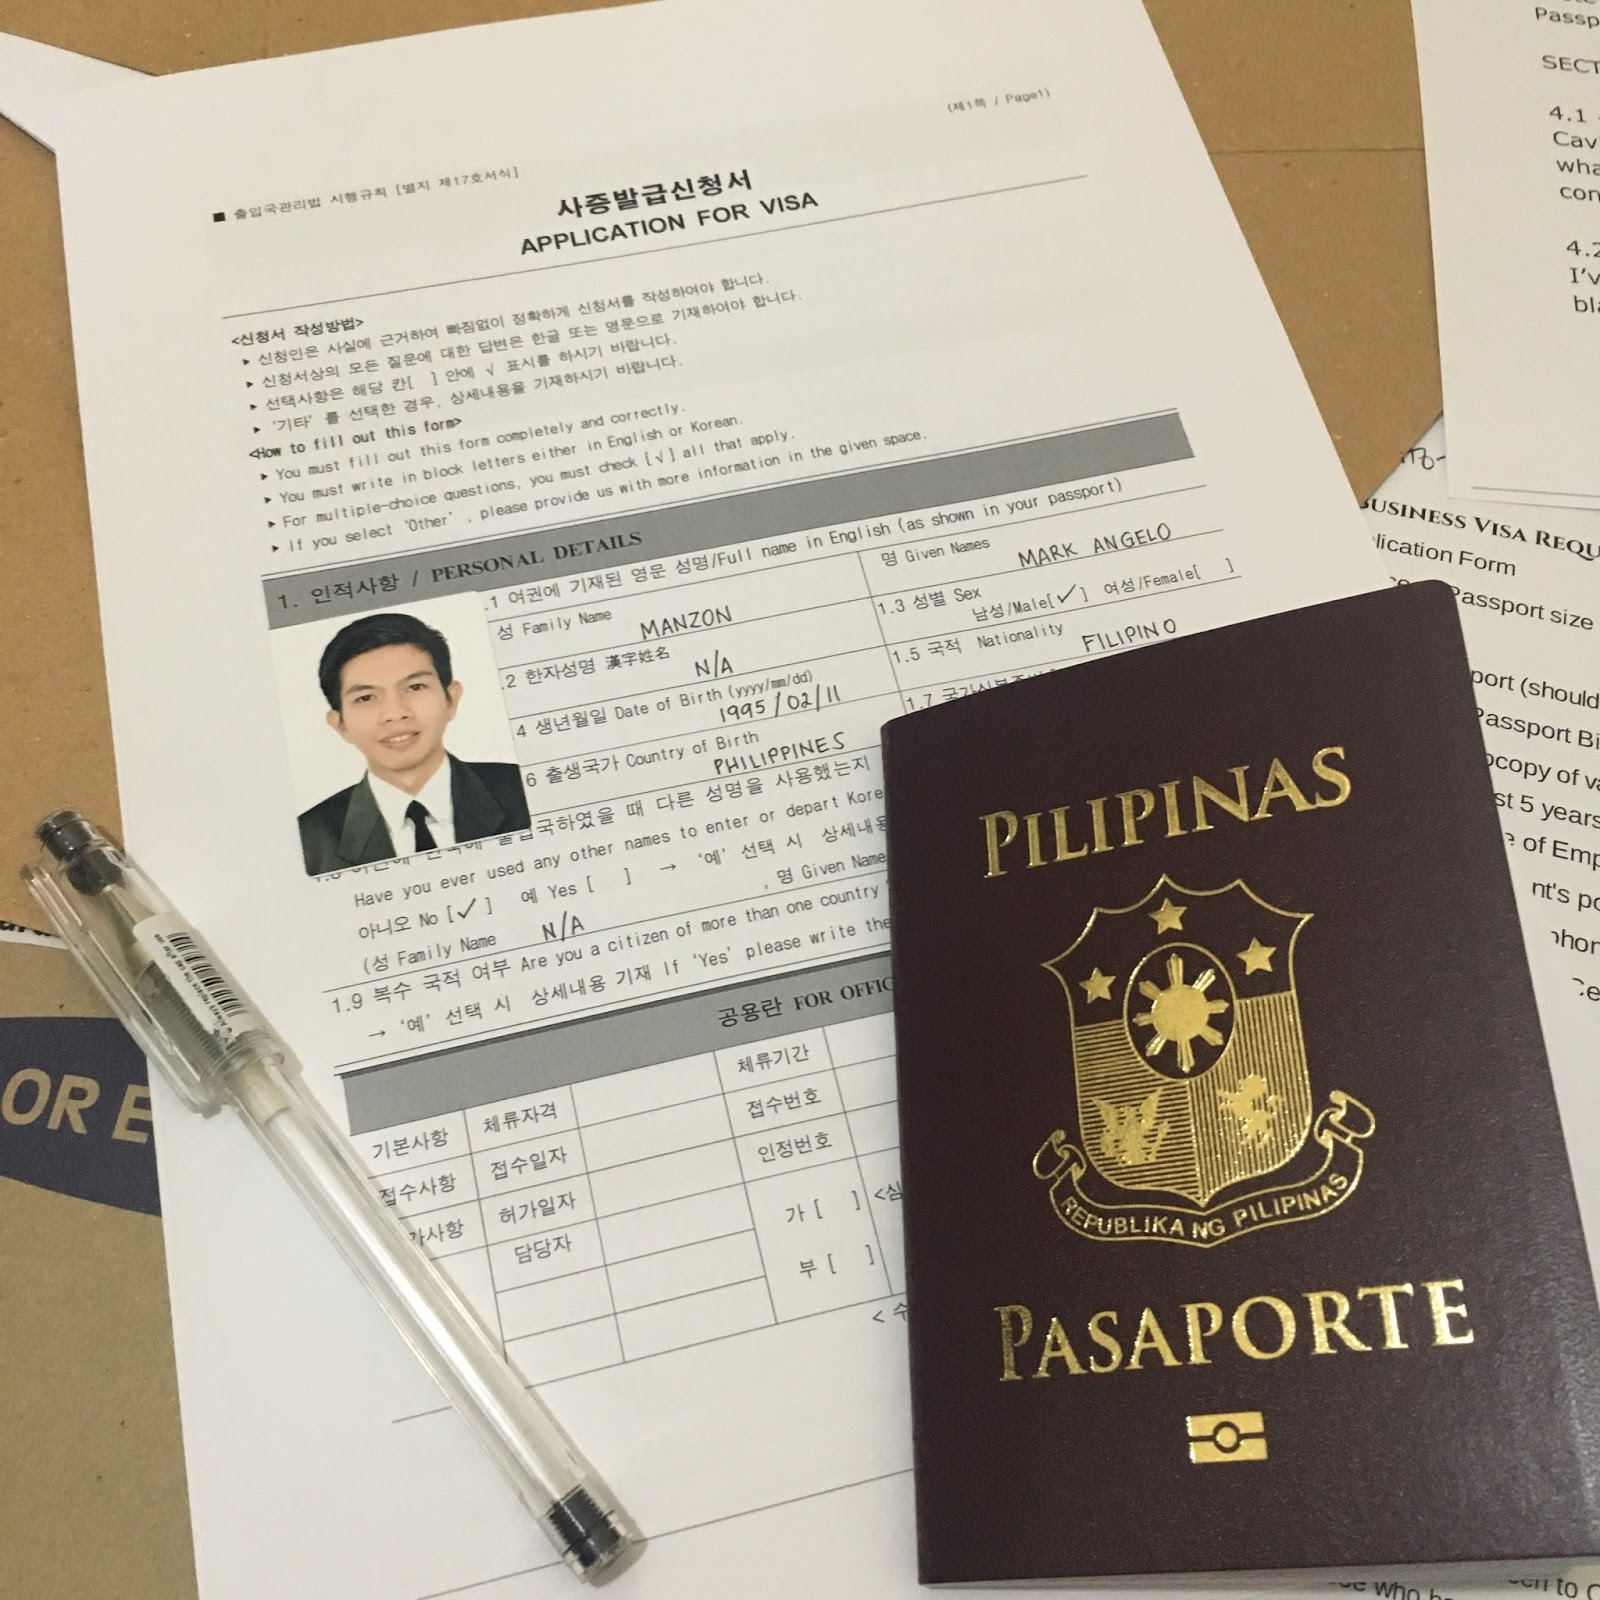 IMG_5795 Visa Application Form Philippines Download on philippines brochure, philippines tax form, philippines home, philippines immigration form, philippines passport, philippines tourism,